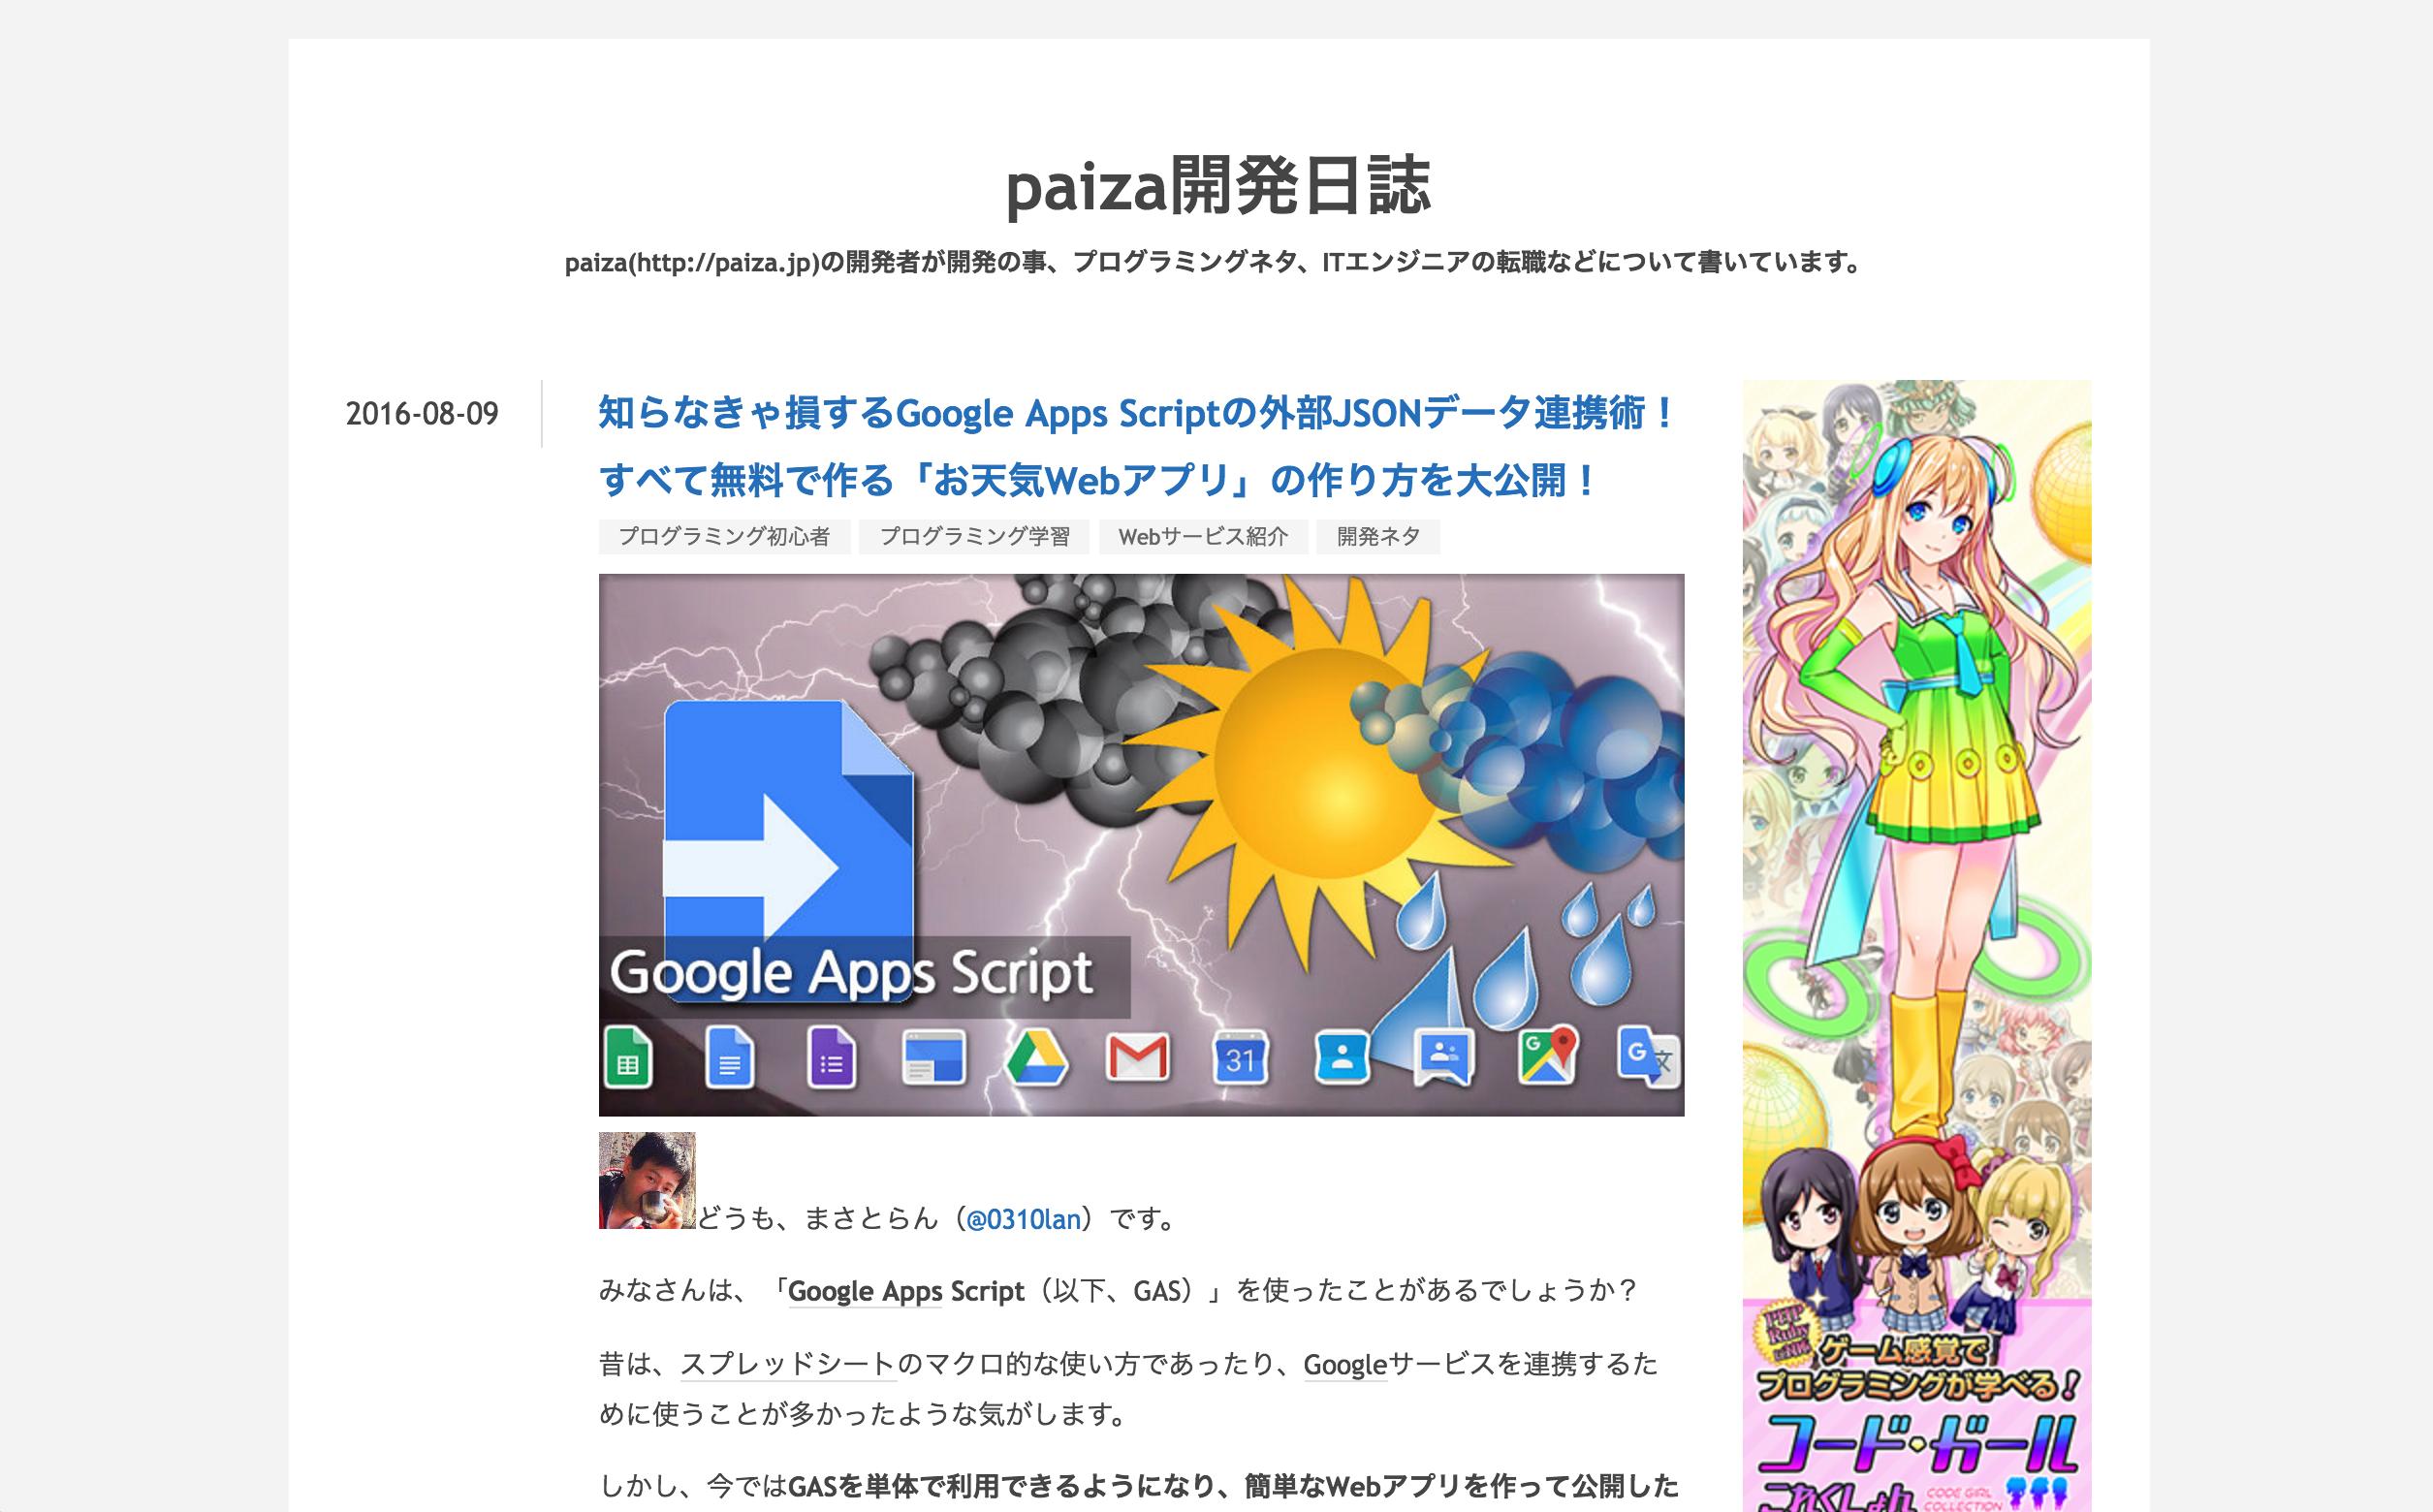 Screenshot 2016-08-10 03.38.56